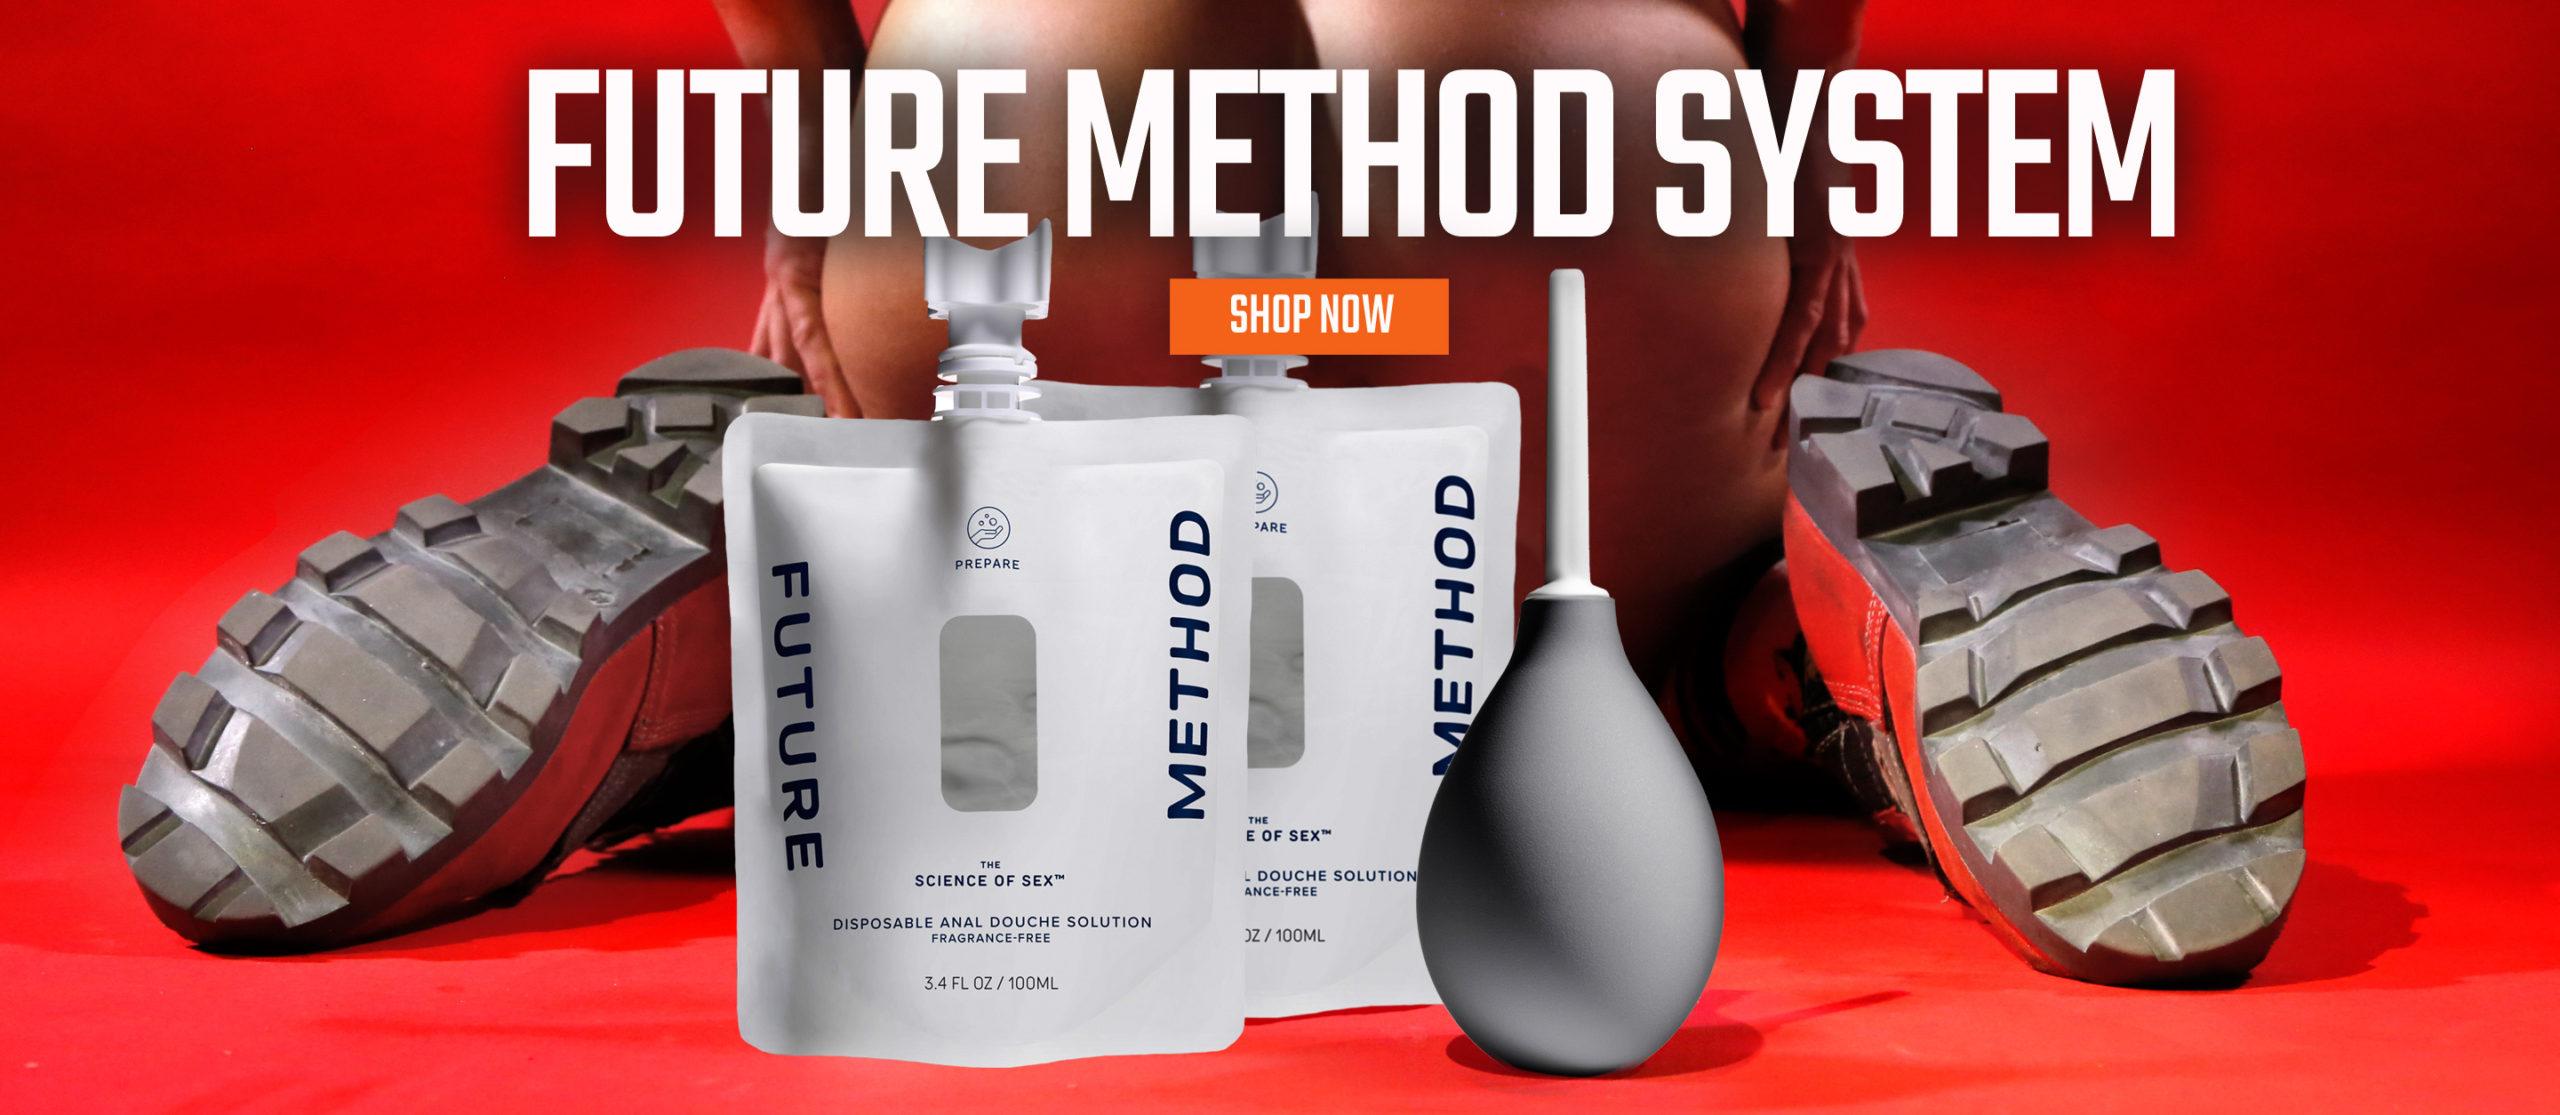 Future Method System